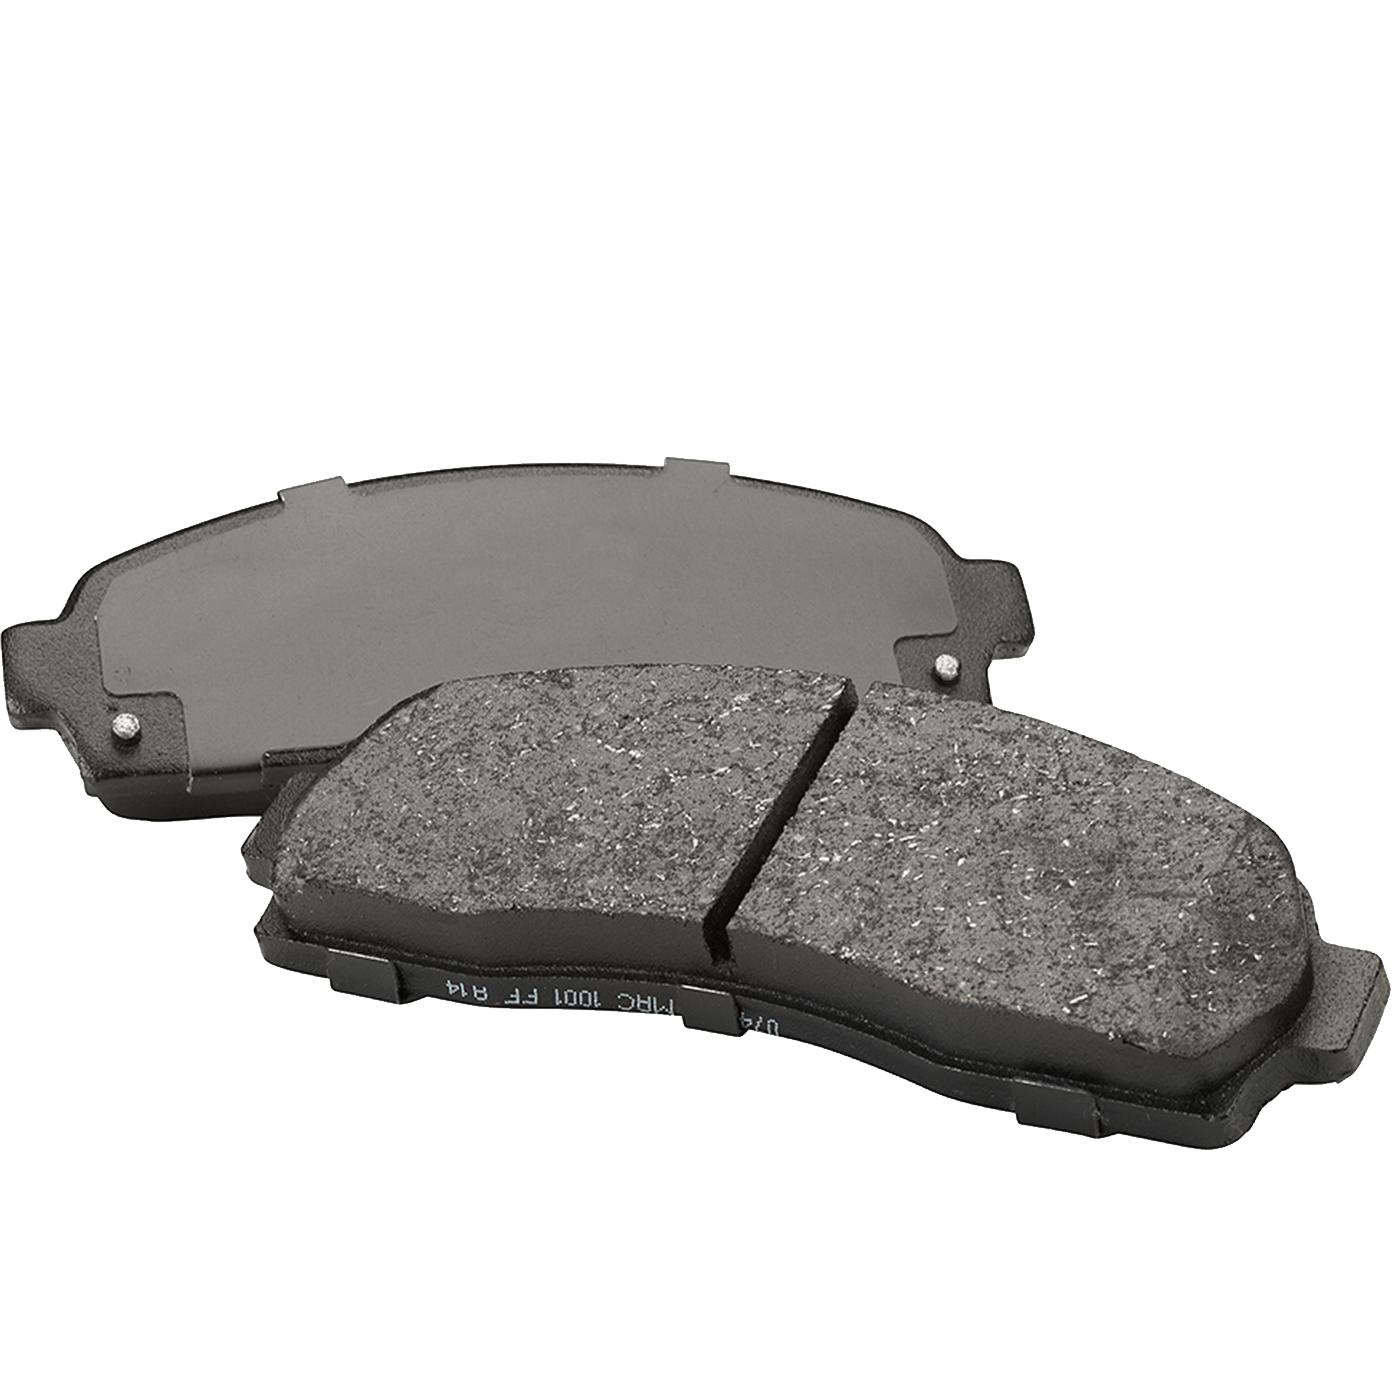 Brake Pad And Lining : Brake pads organic ceramic and semi metallic what are